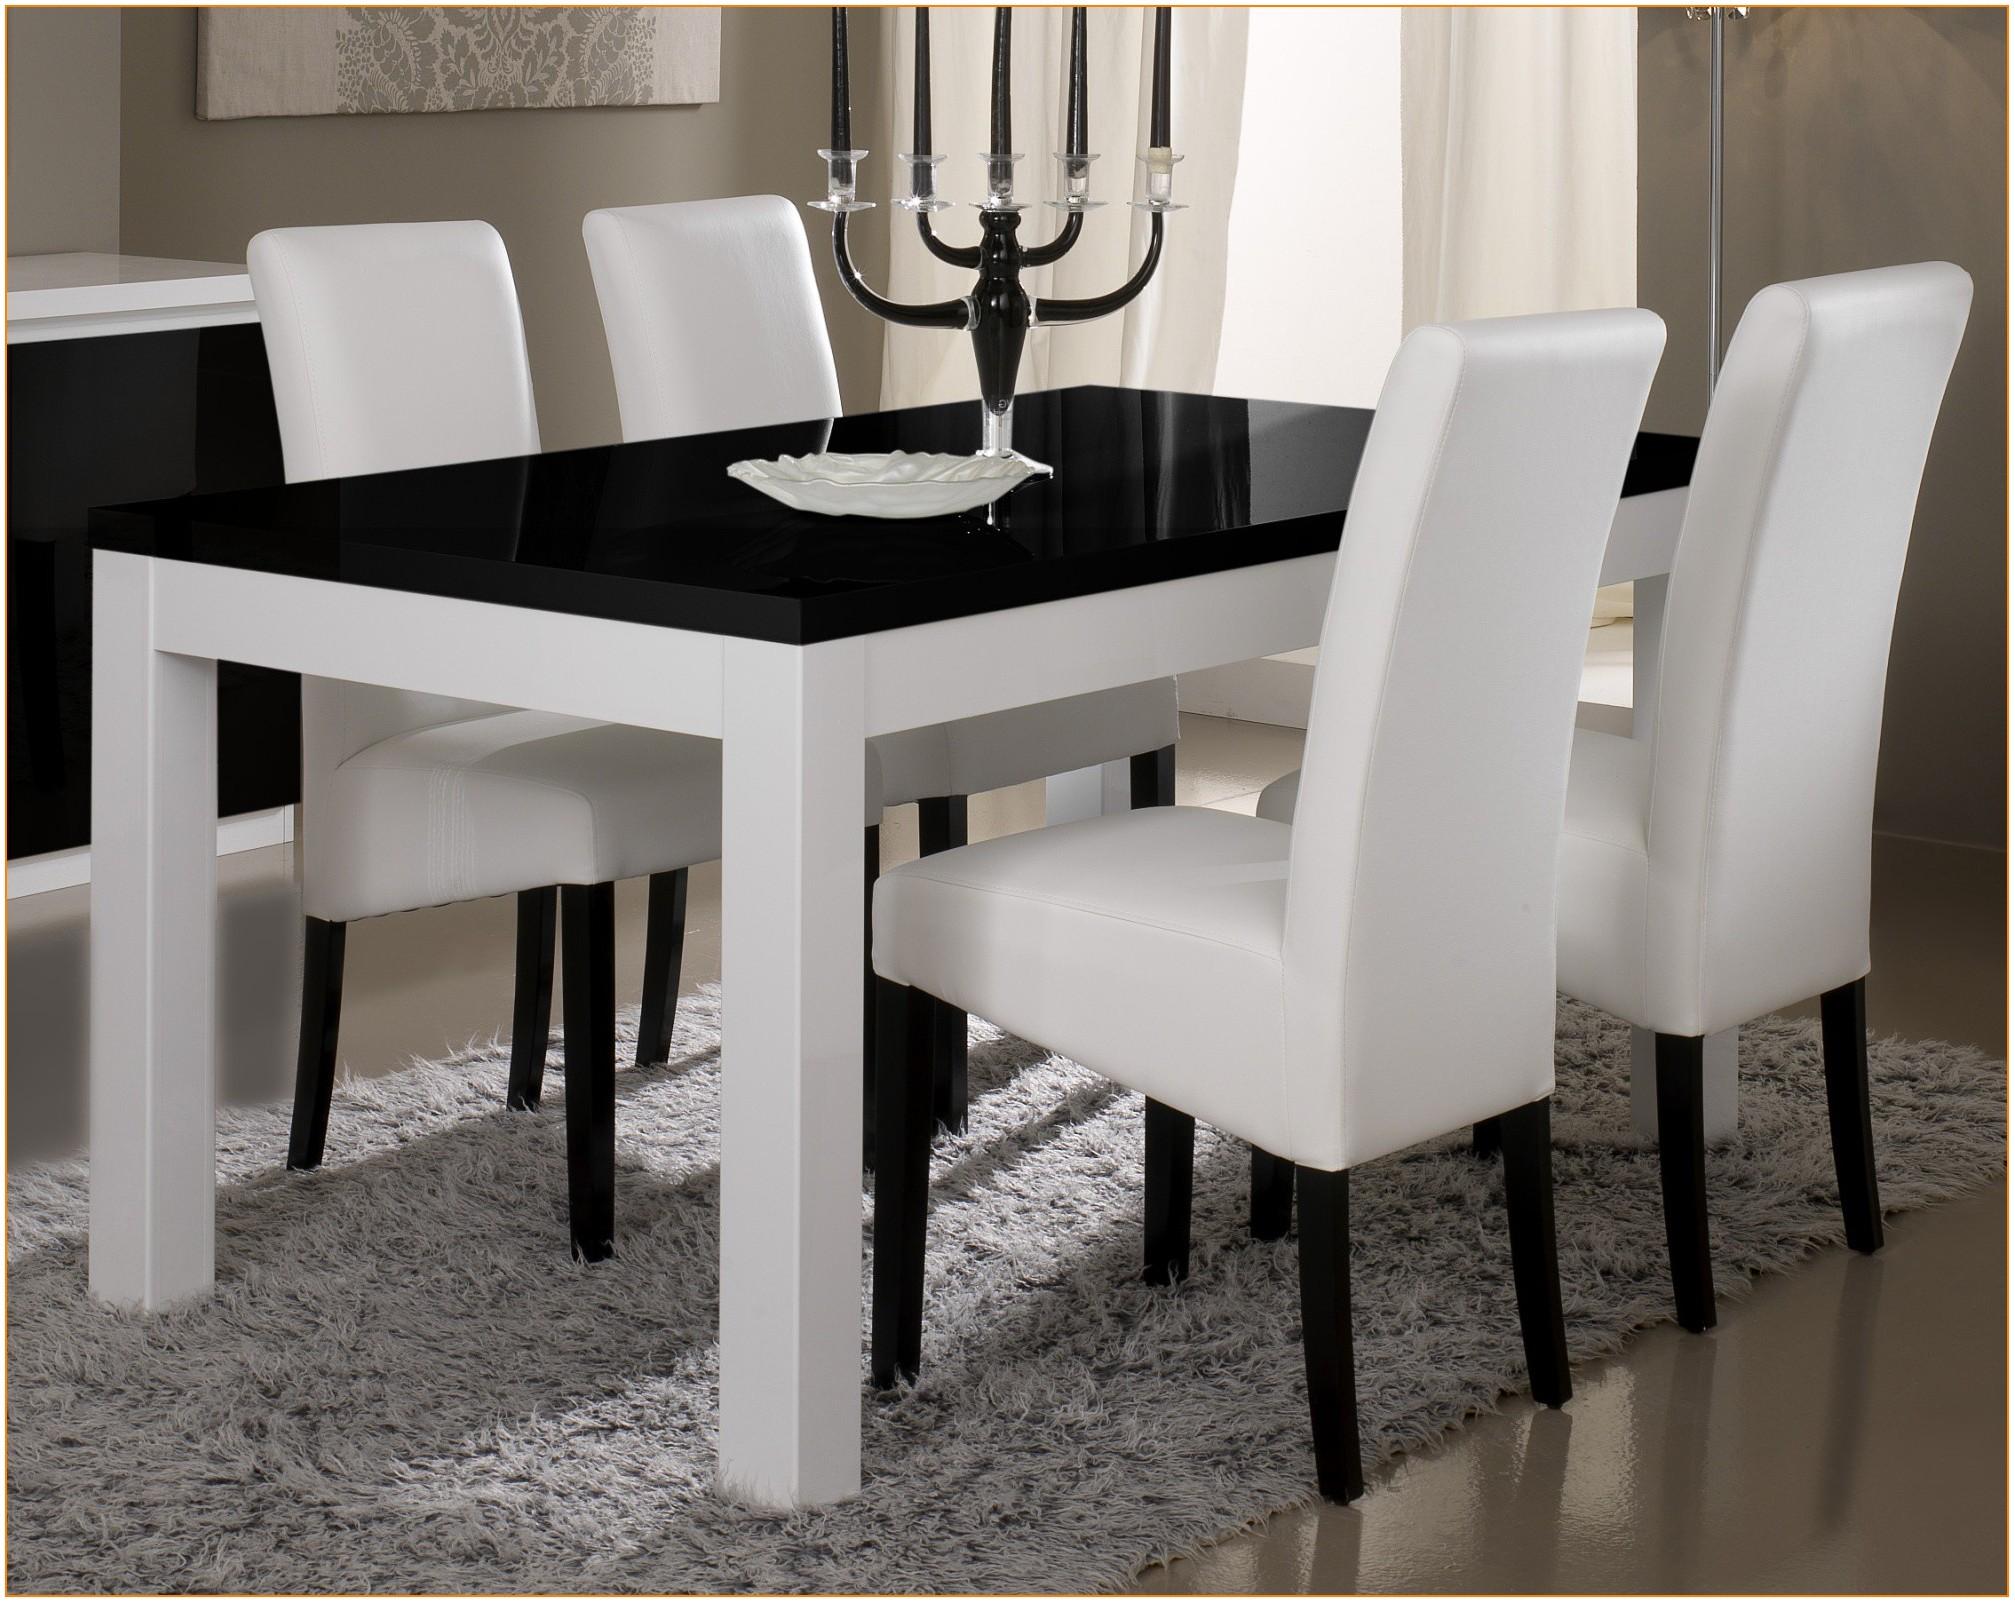 Table De Salle A Manger Moderne Blanche